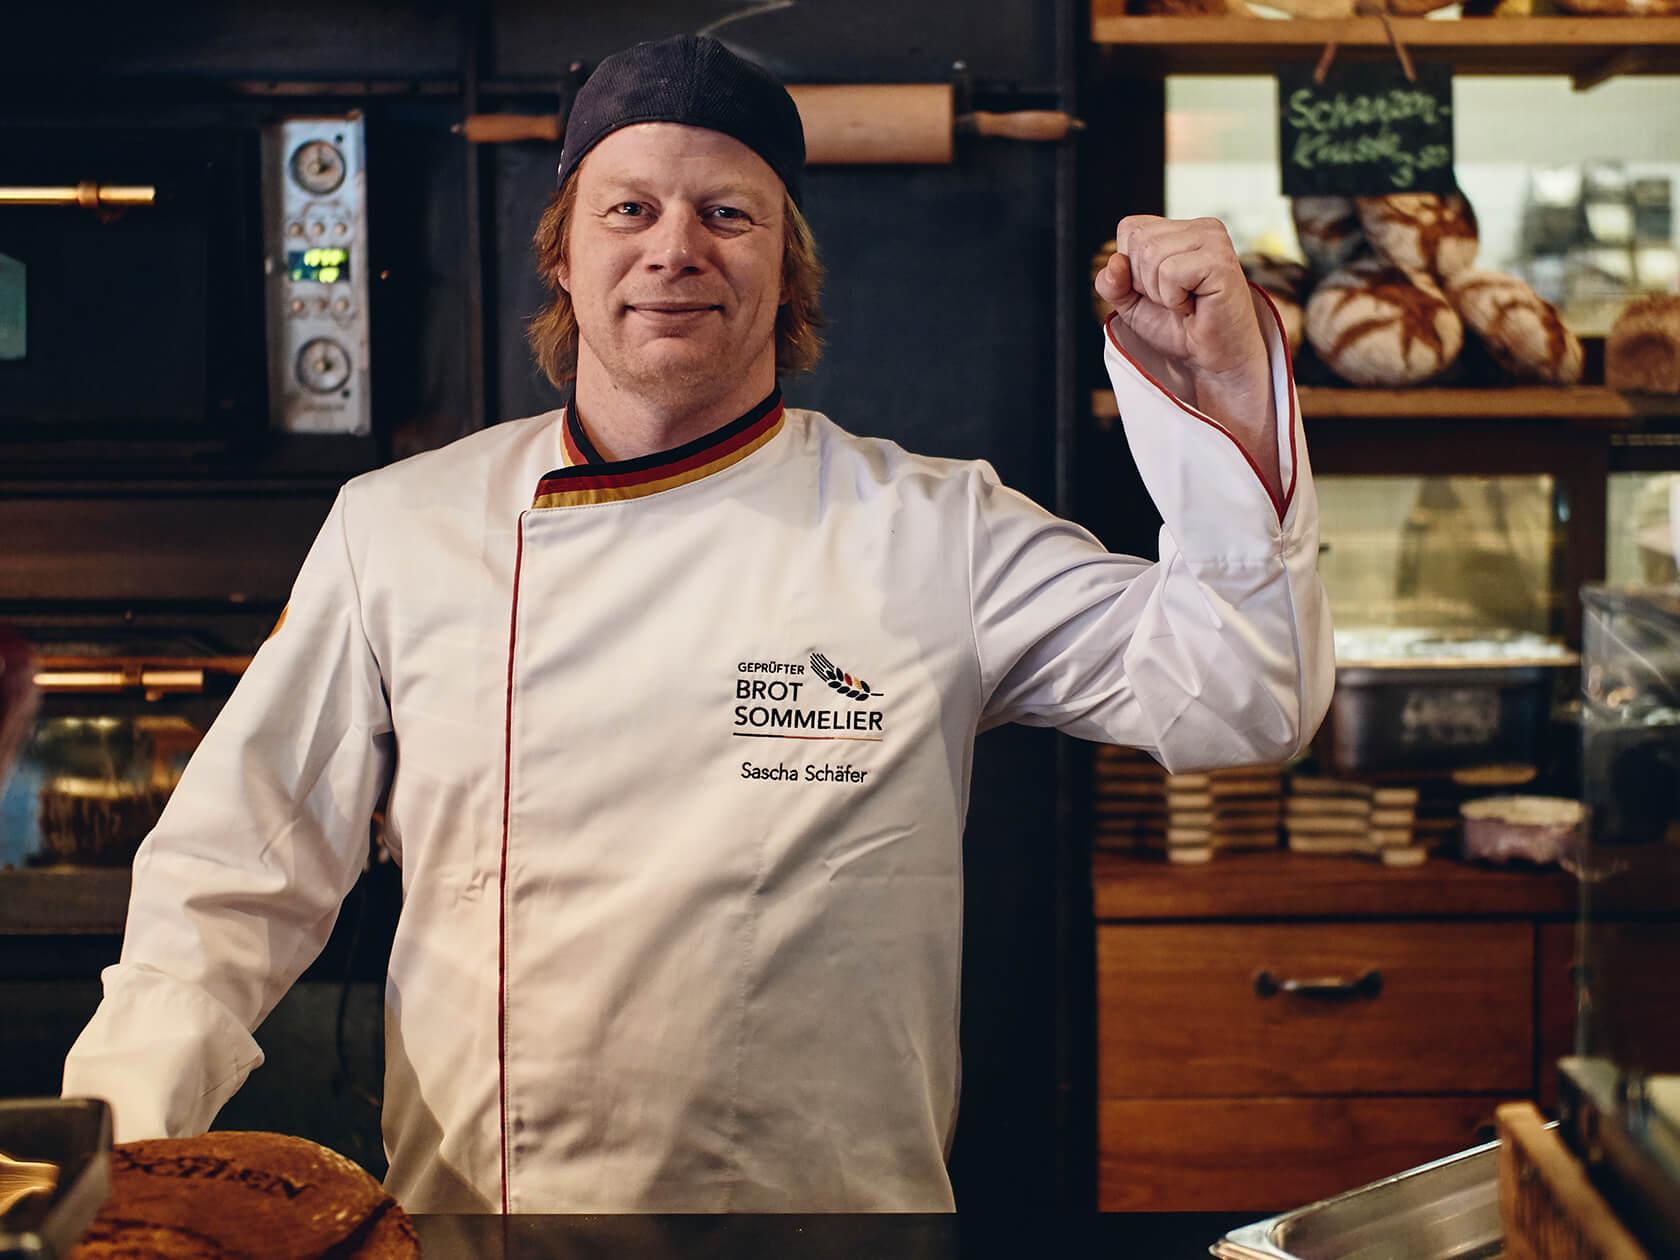 Brotsommelier, Brot Sommelier, Brot Sommelier Hamburg